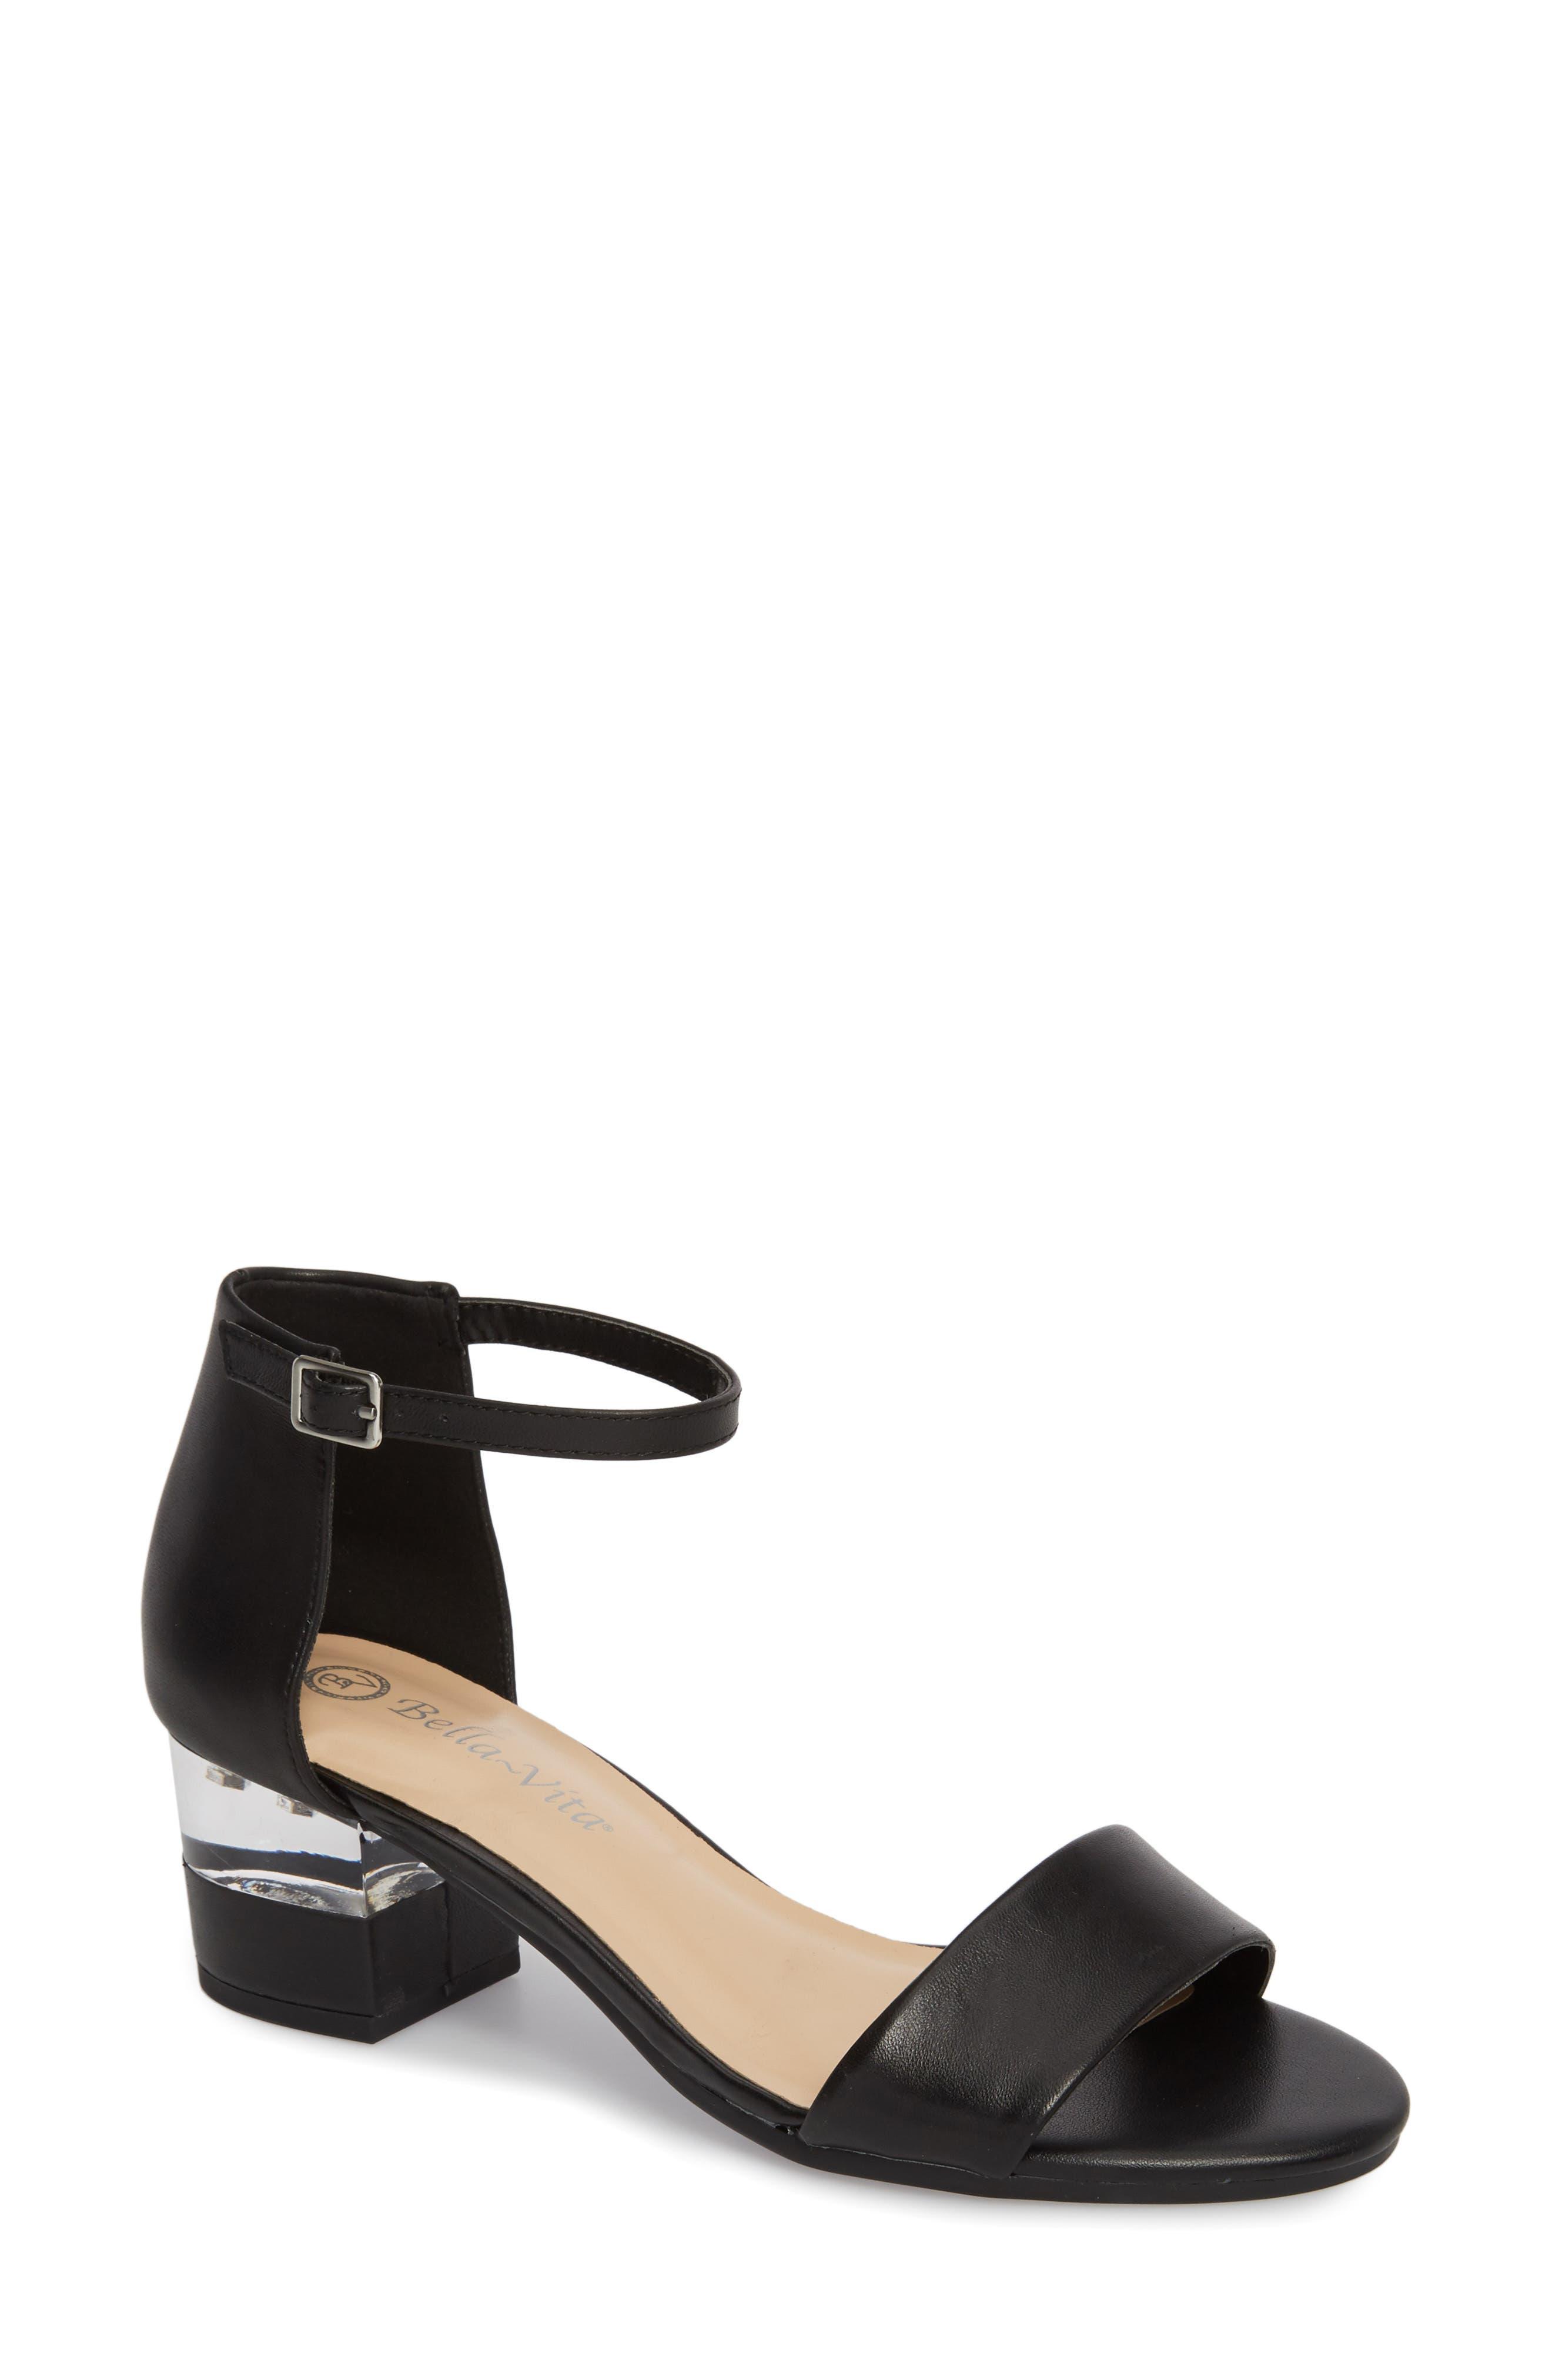 Bella Vita Fitz Block Heel Sandal, Black